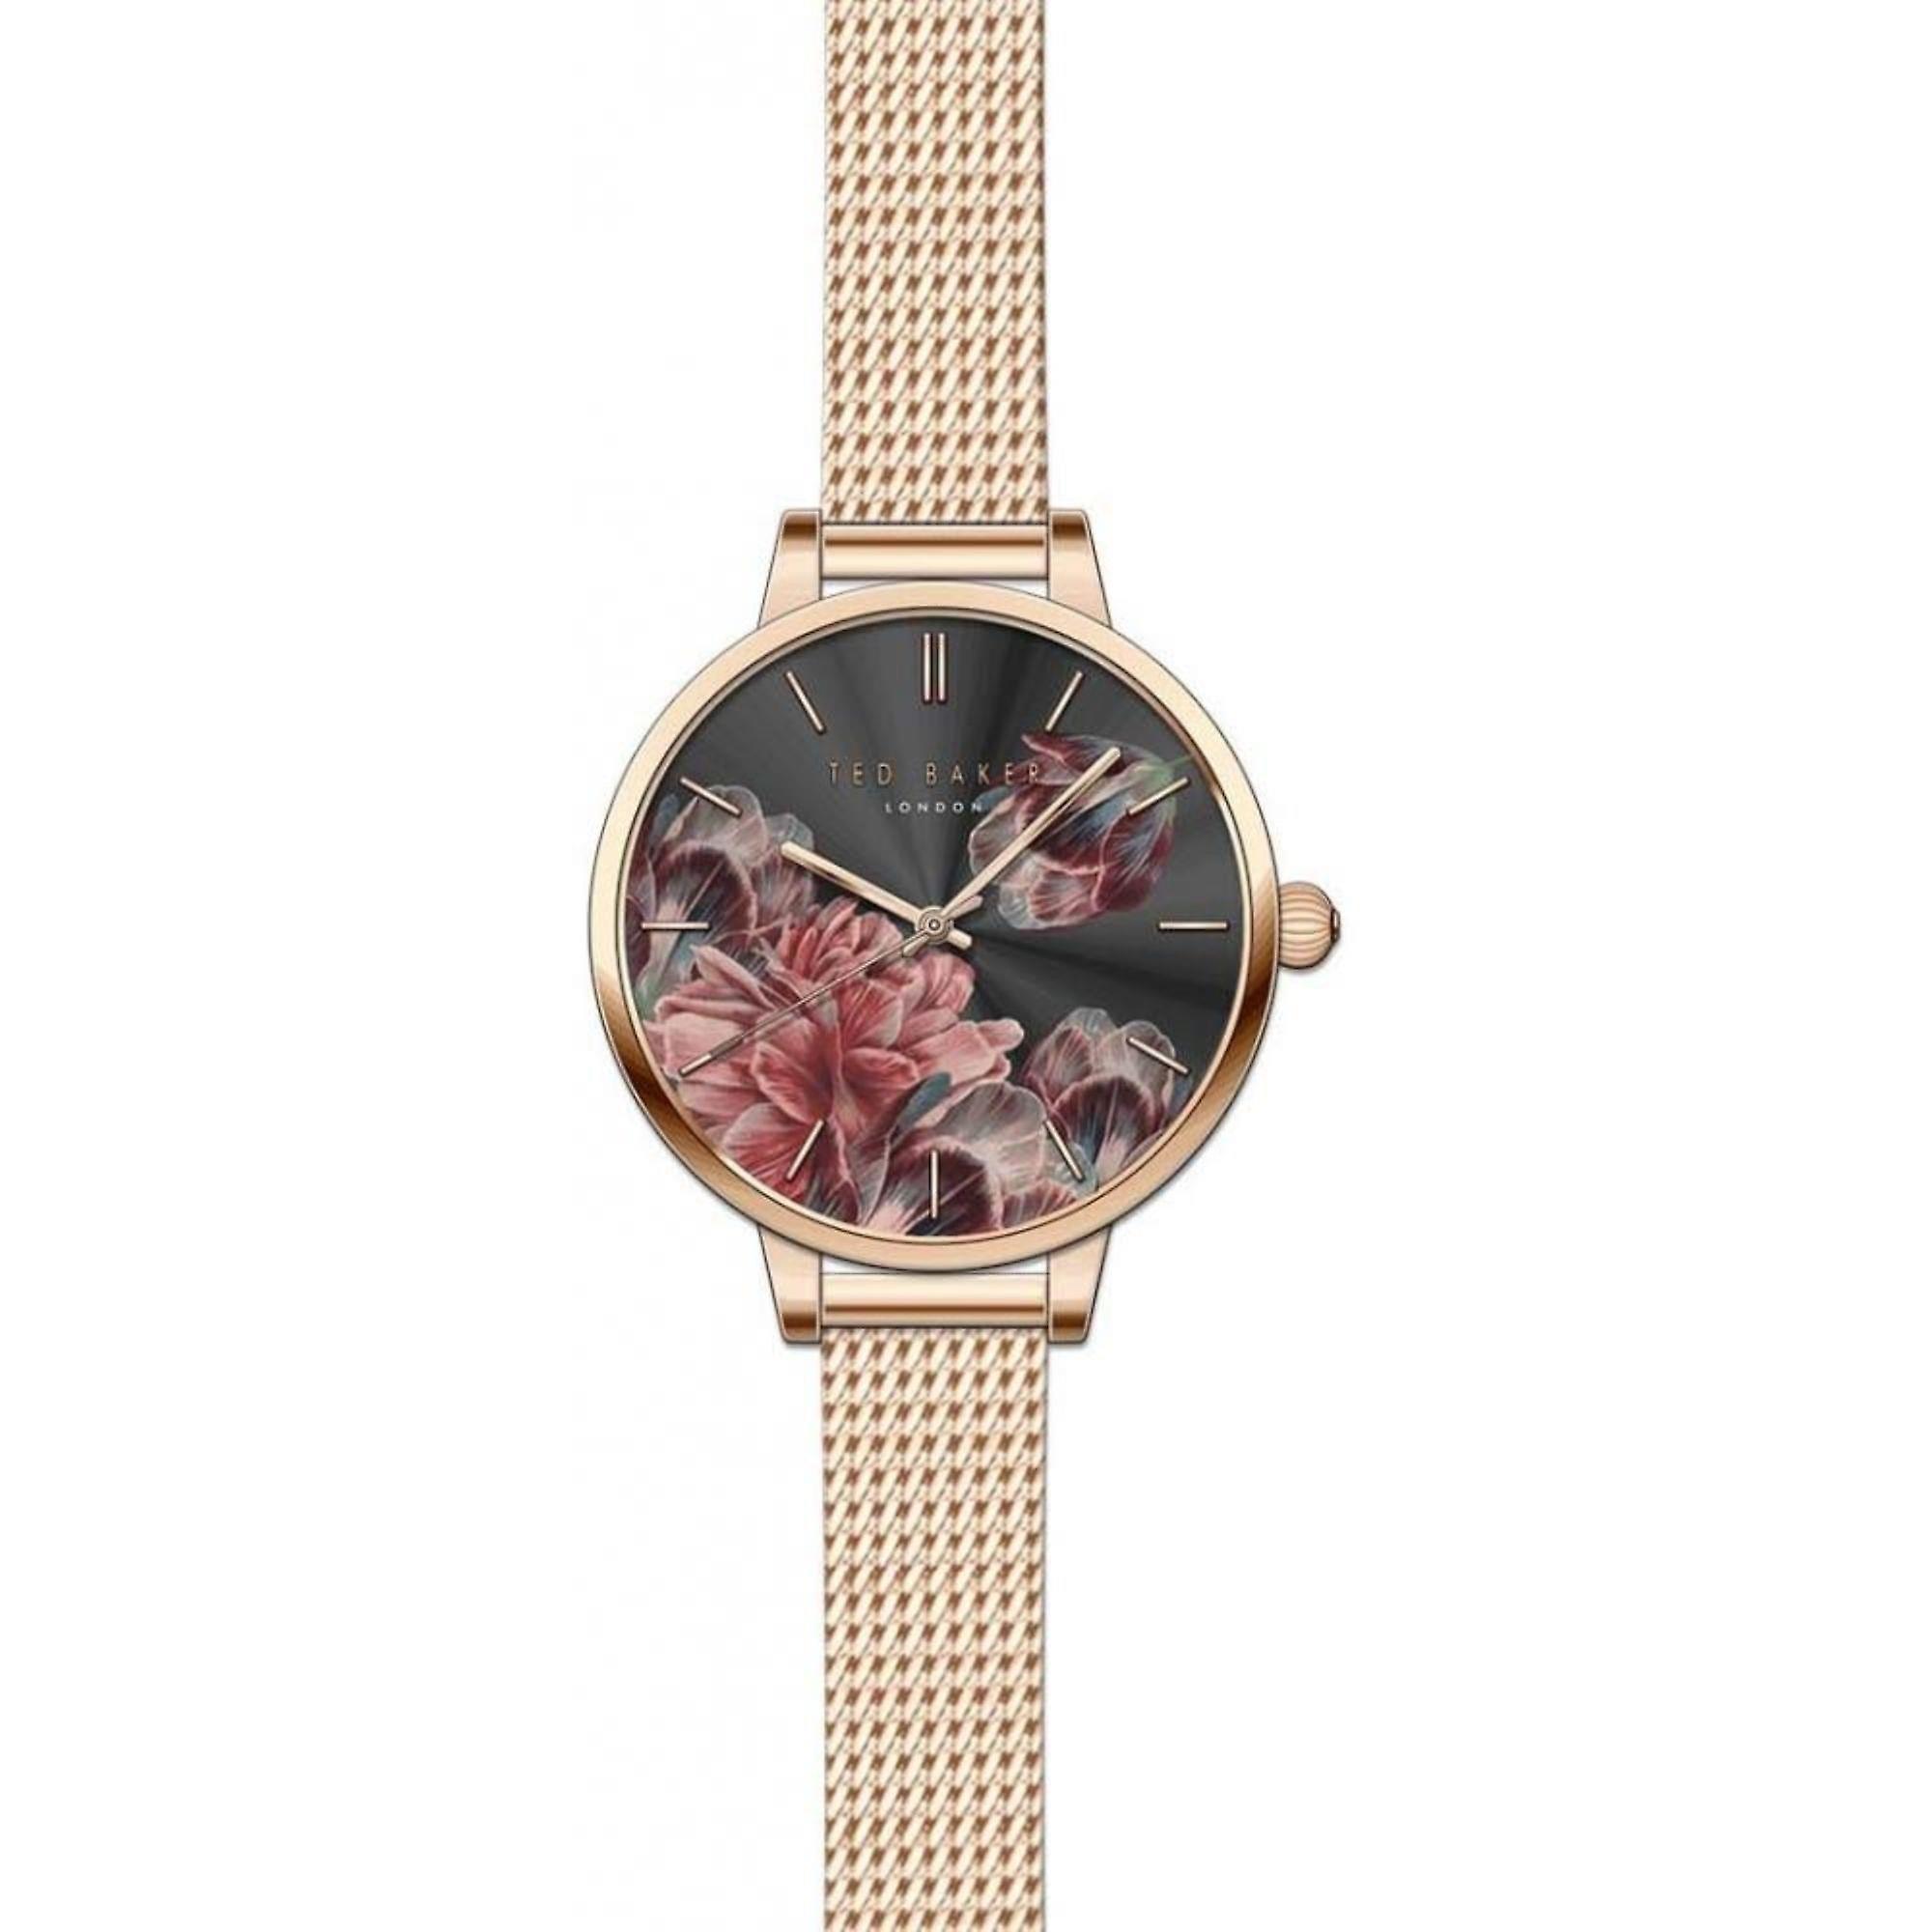 Ted Baker Kate Quartz Floral Dial Rose Gold Mesh Stainless Steel Ladies Watch TE50070002